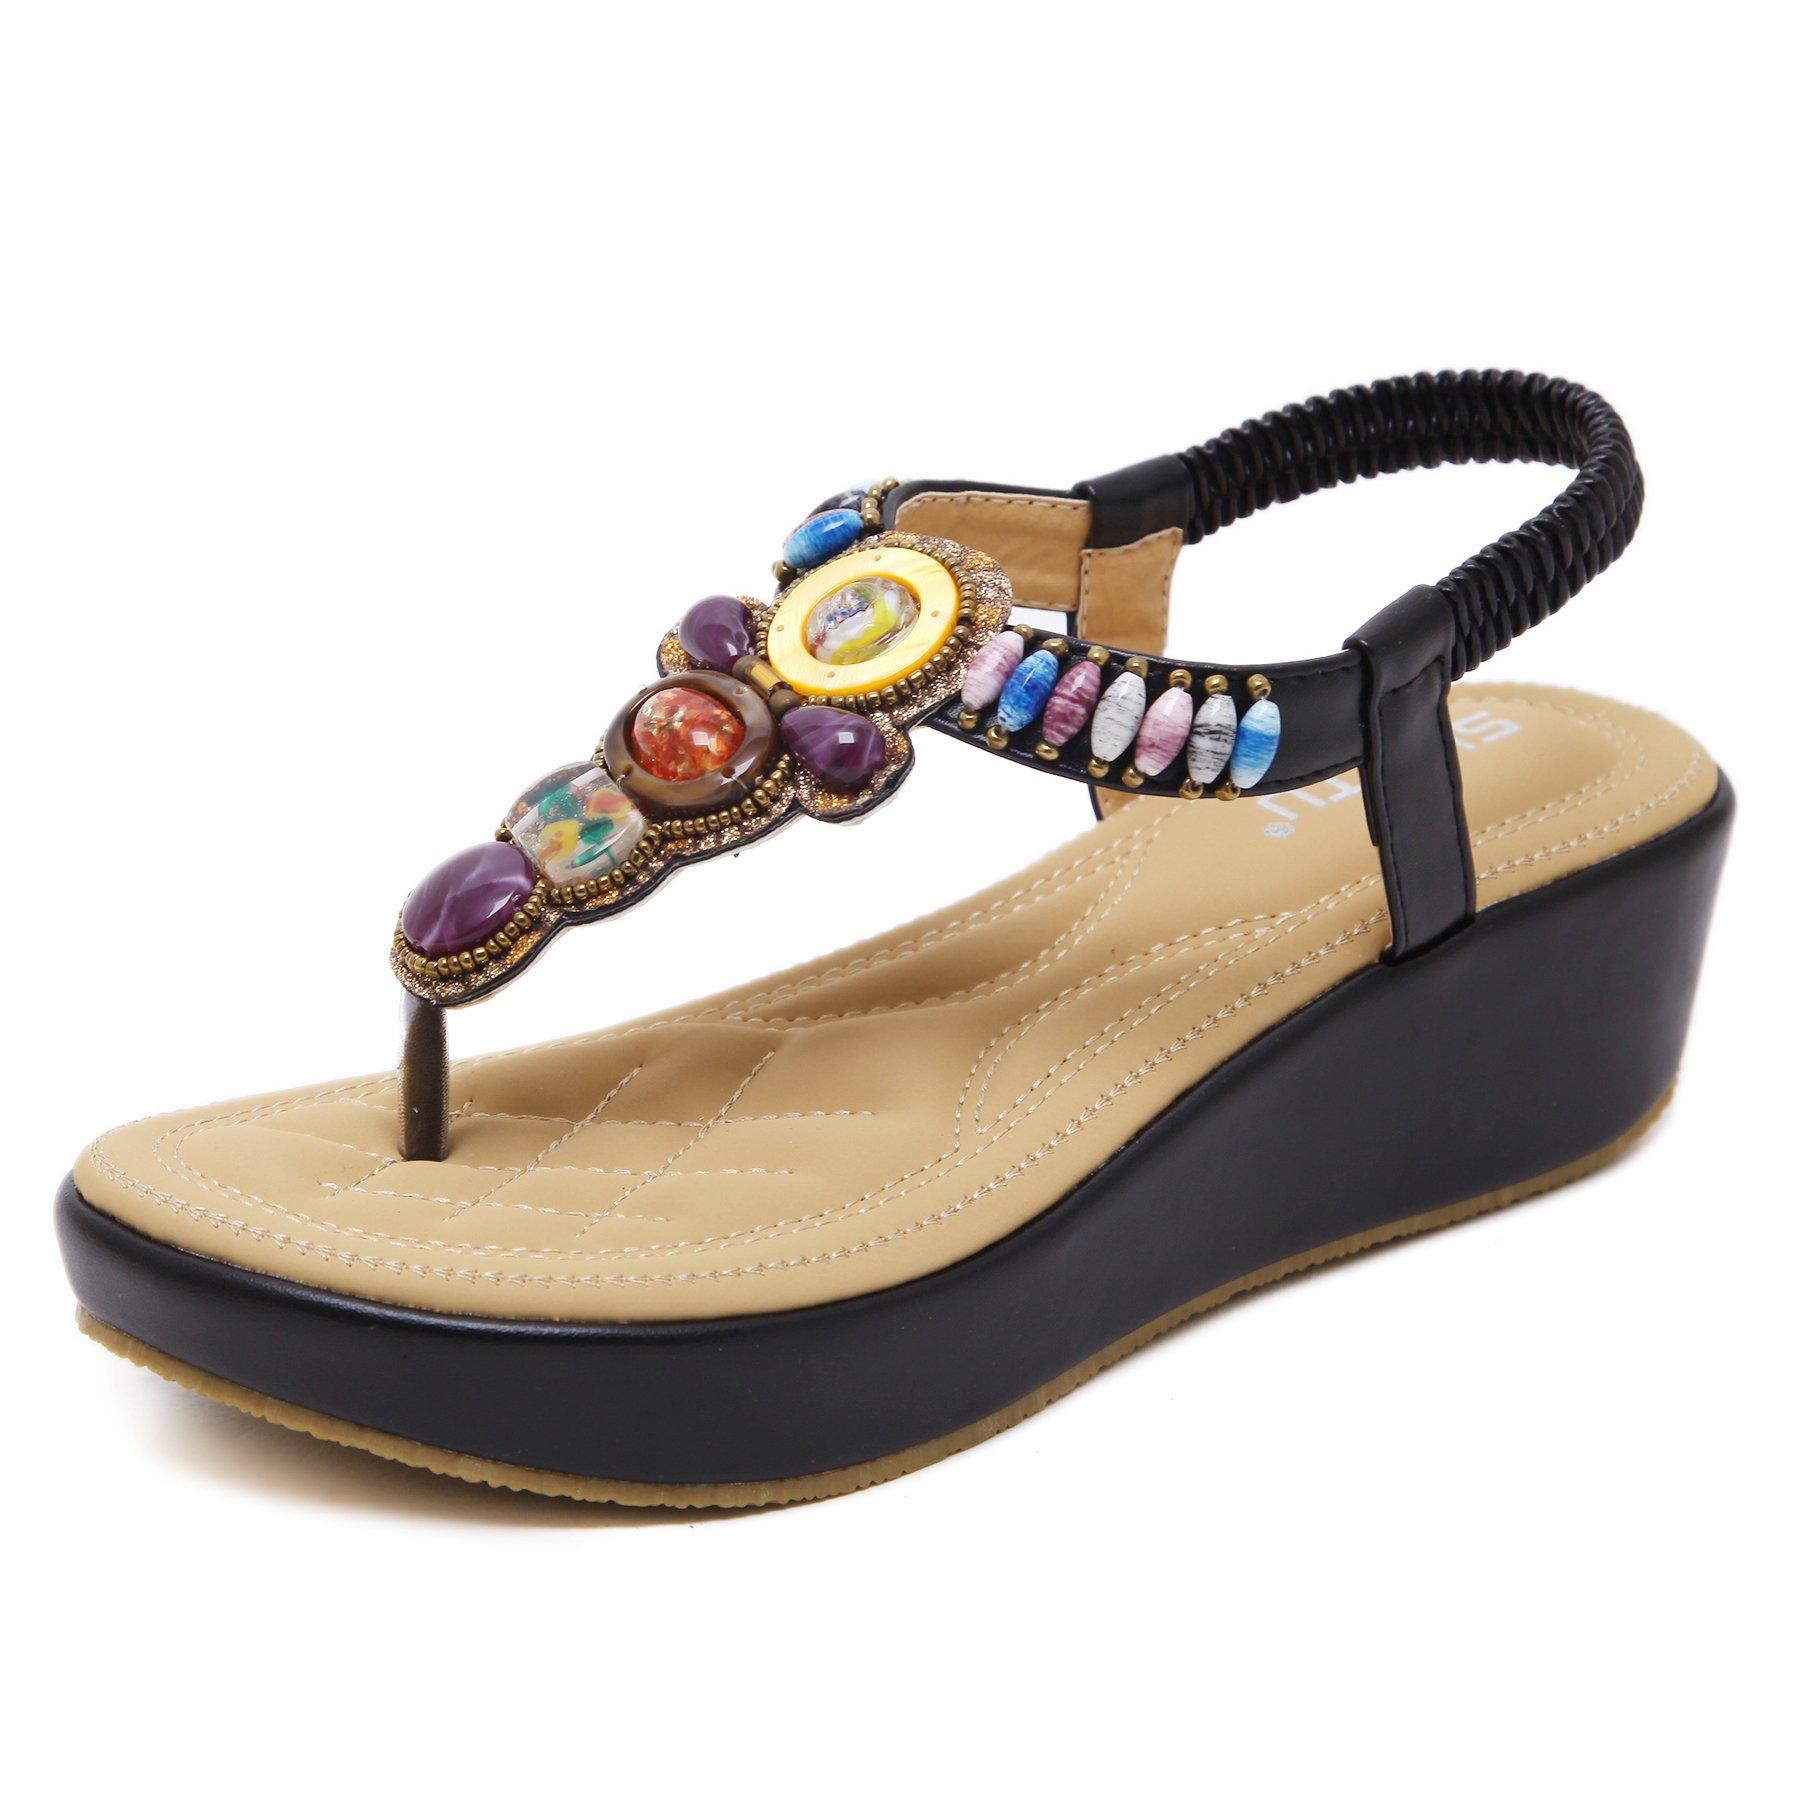 Huagmei Womens Wedge Sandals Thong Platform Beaded Slingback Bohemia Summer Sandal